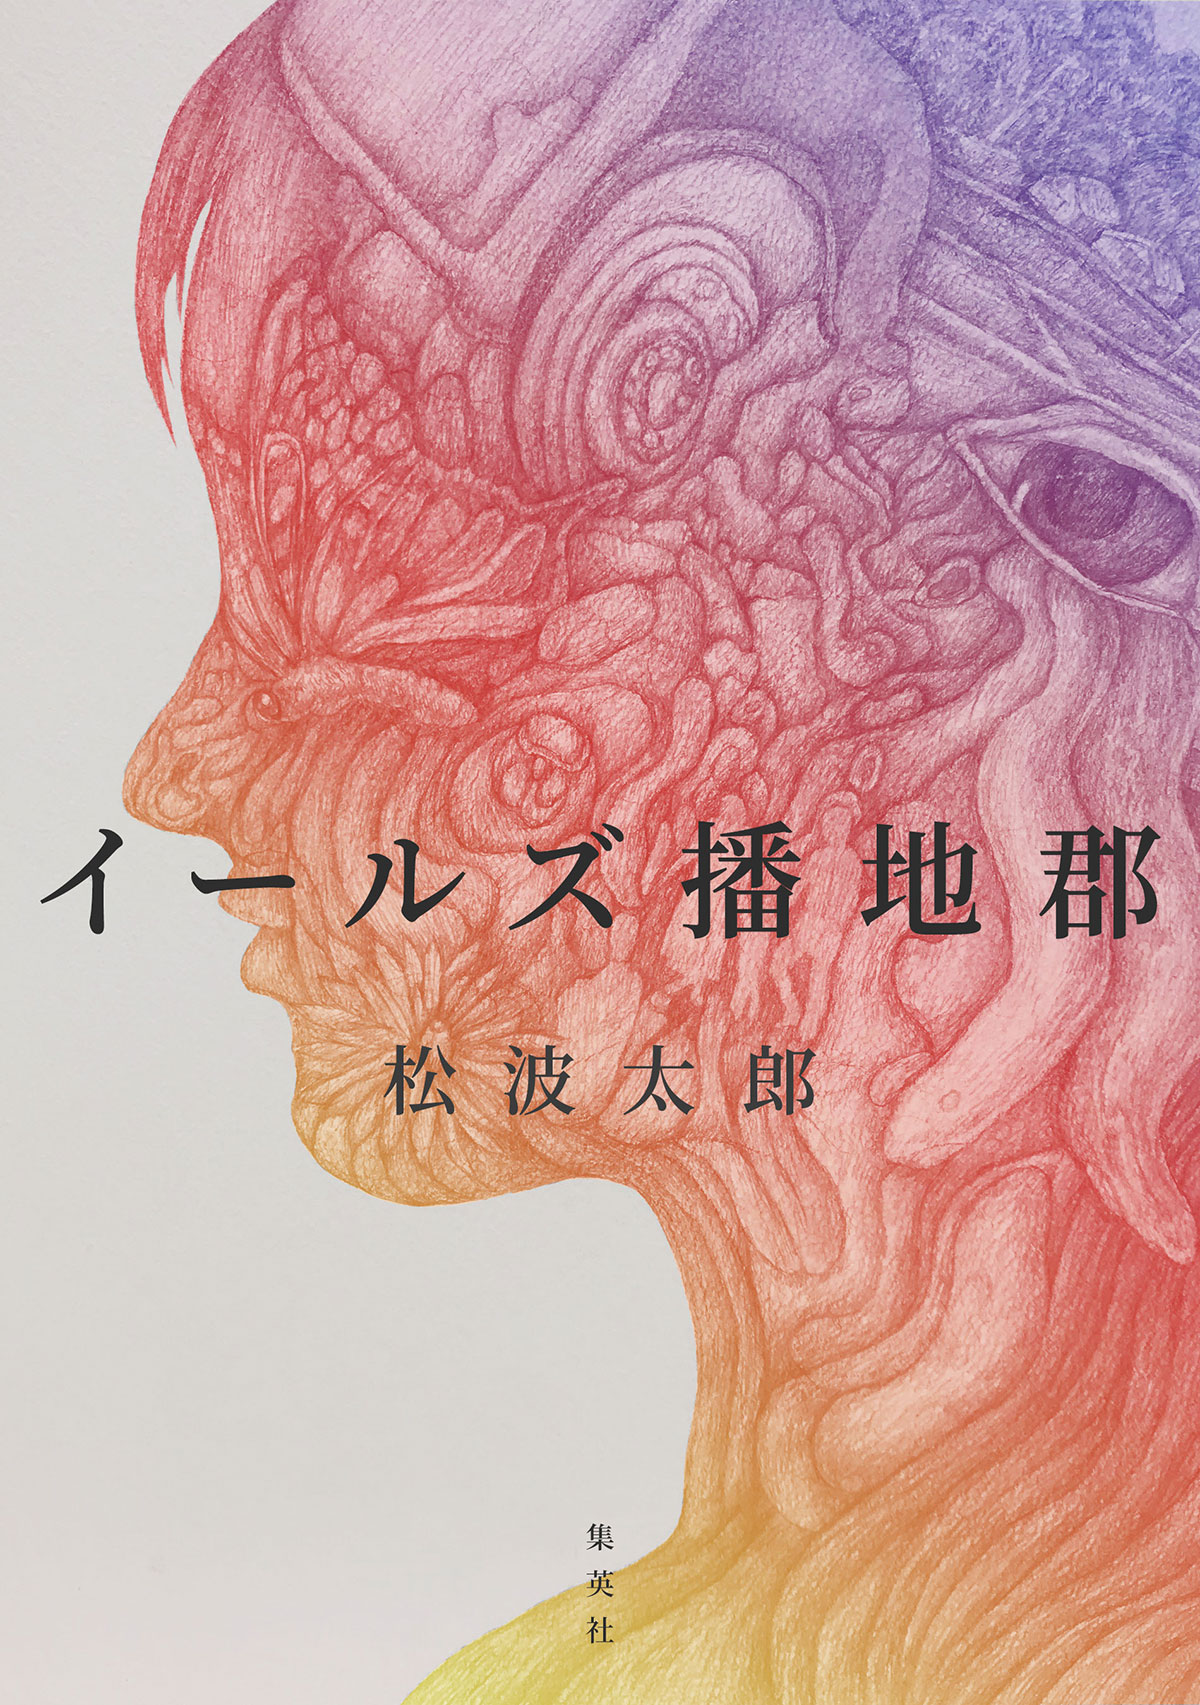 松波太郎の小説